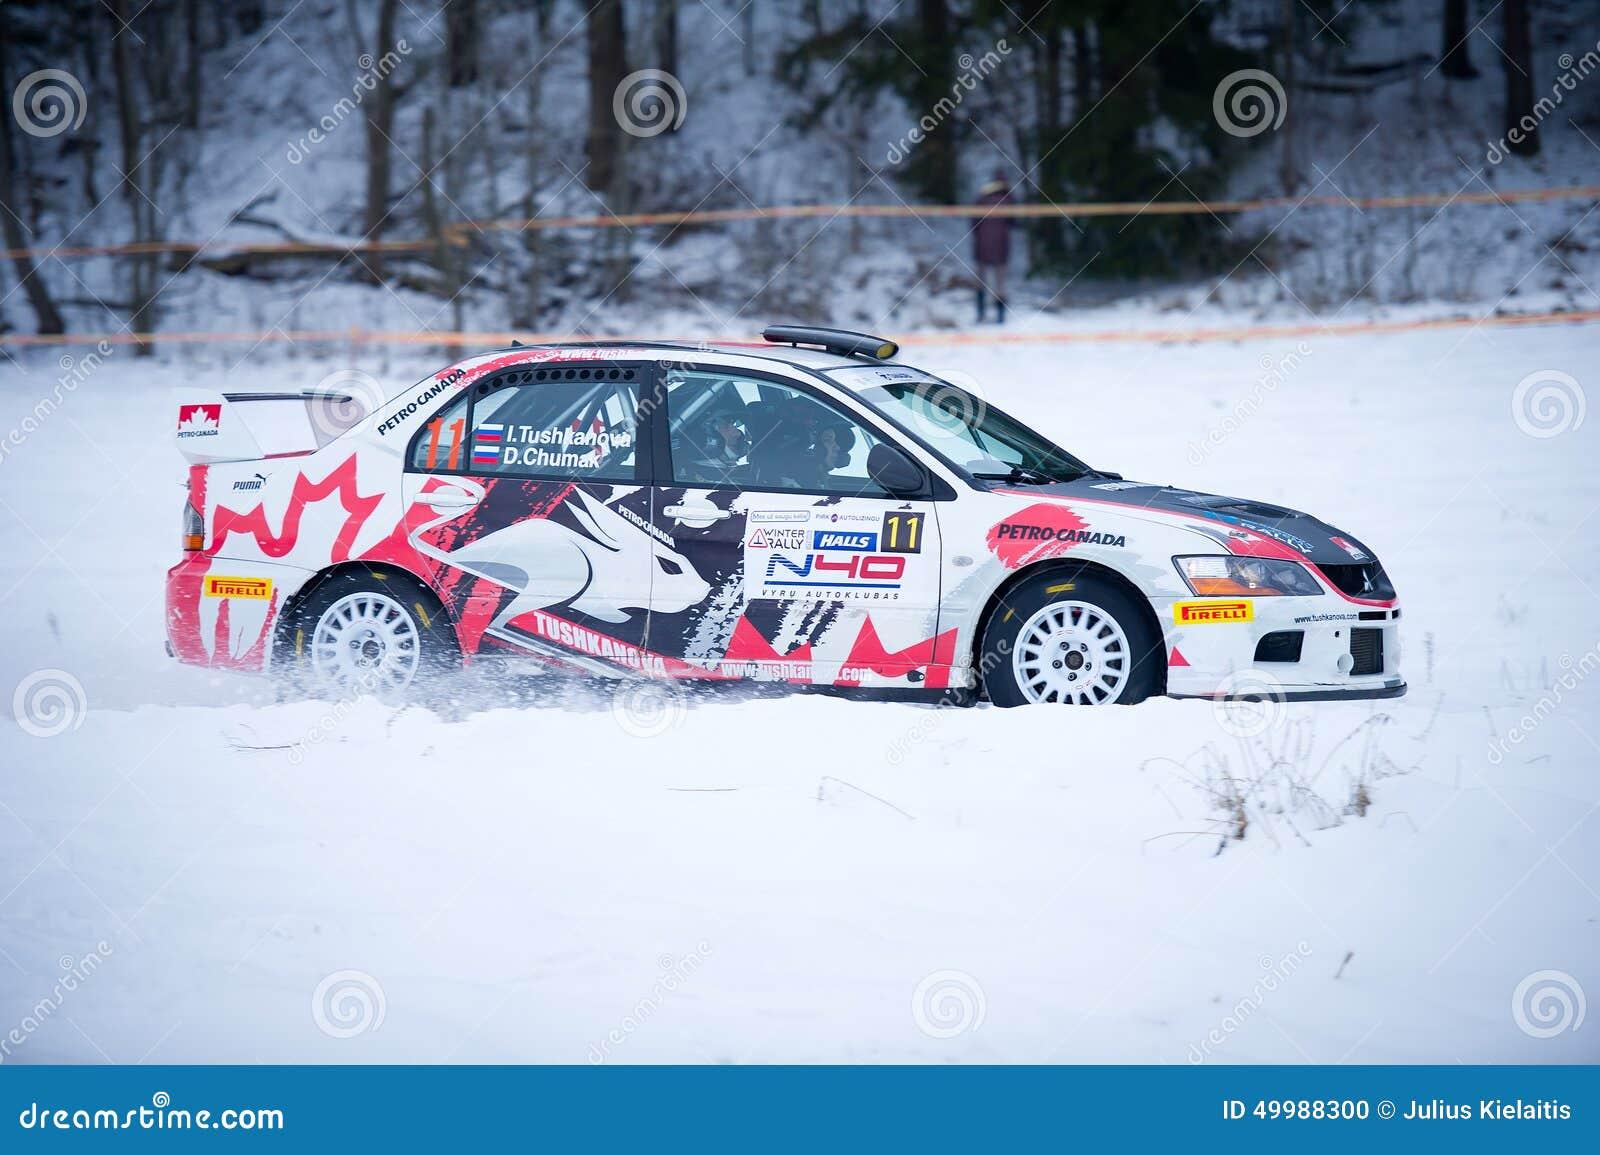 Mitsubishi Lancer Evo Ix Rally Car Editorial Image Image Of Auto